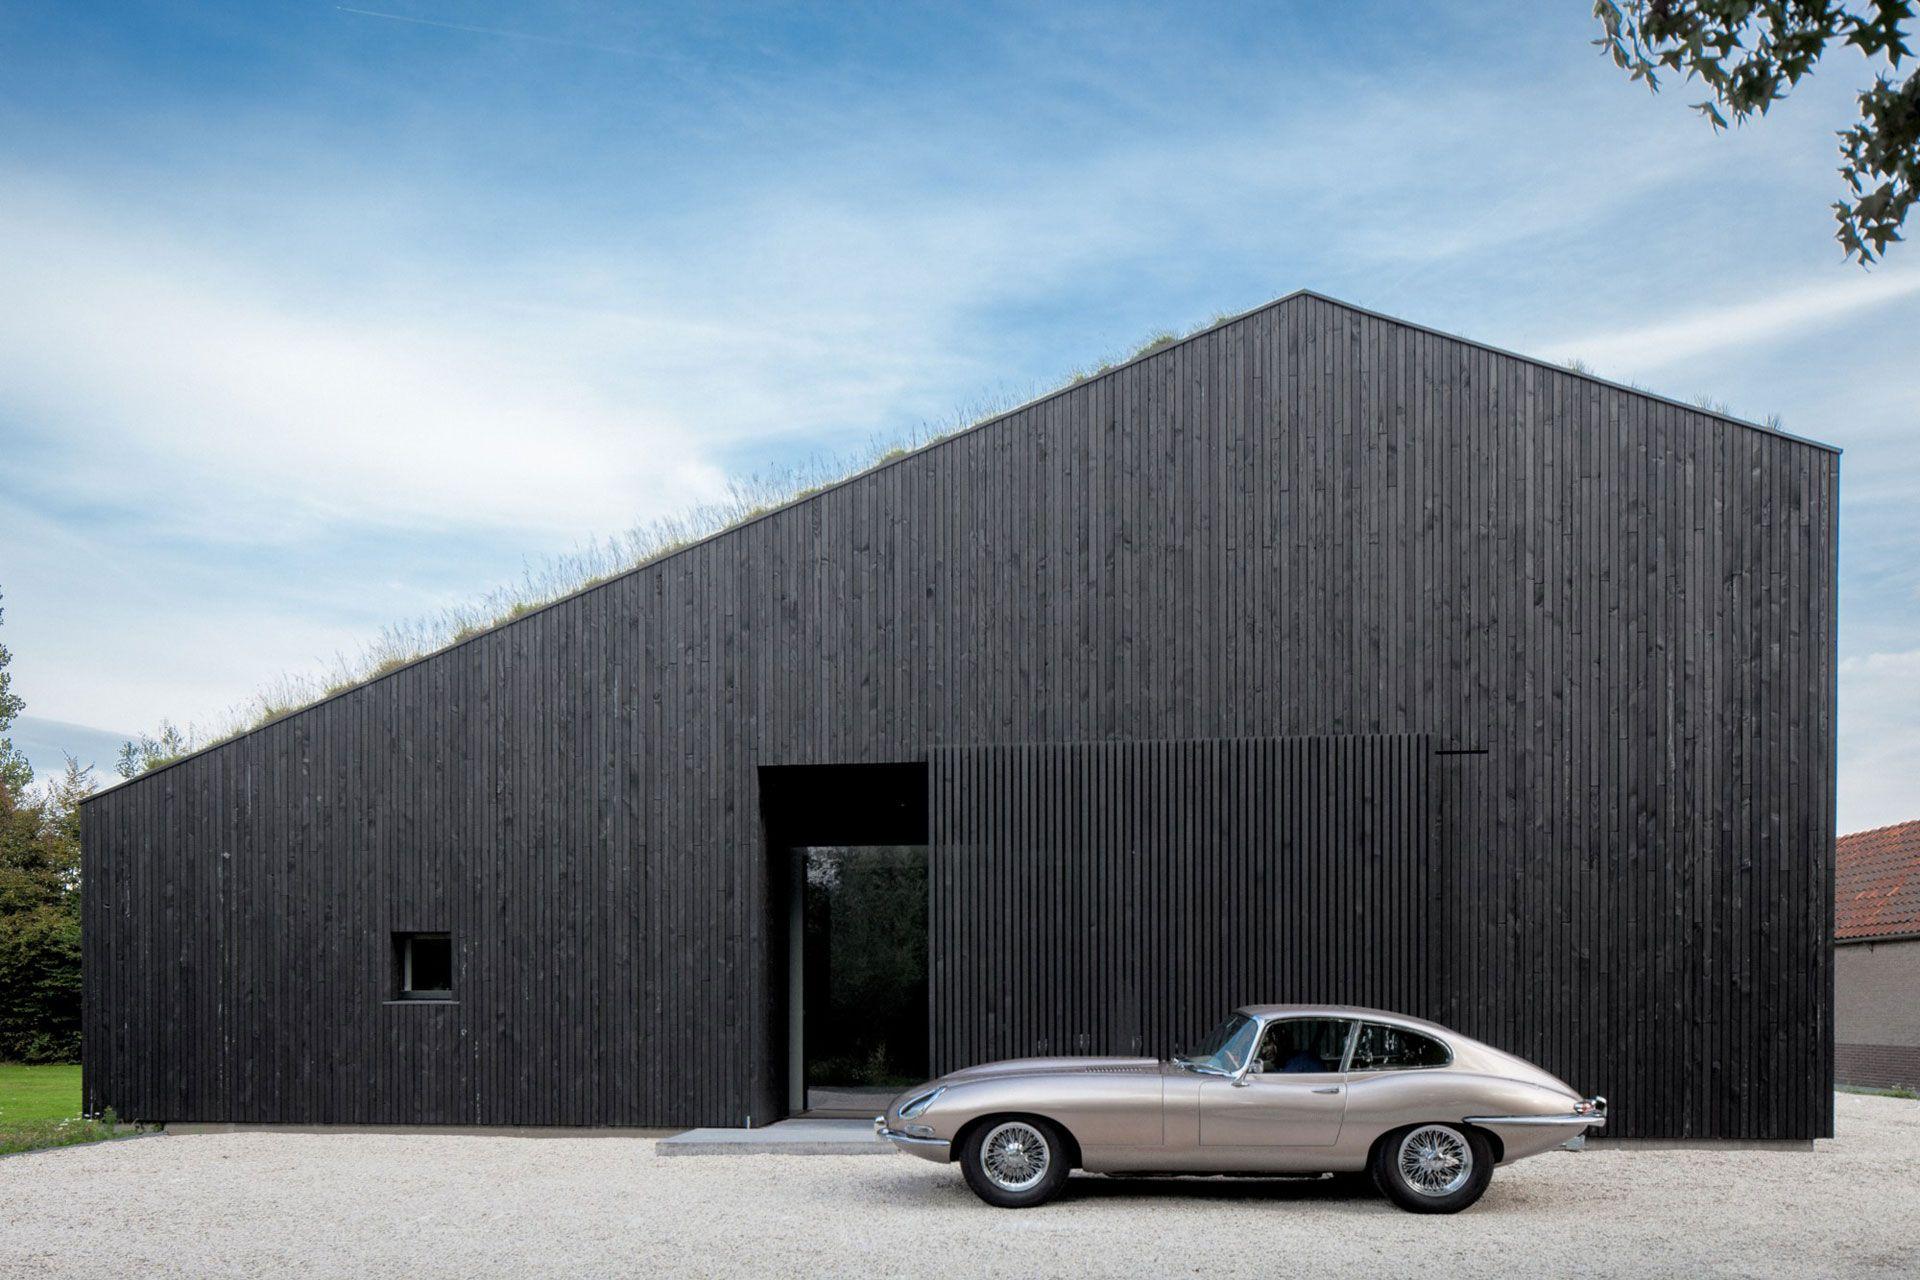 villa sg21 holzfassaden wood facade. Black Bedroom Furniture Sets. Home Design Ideas